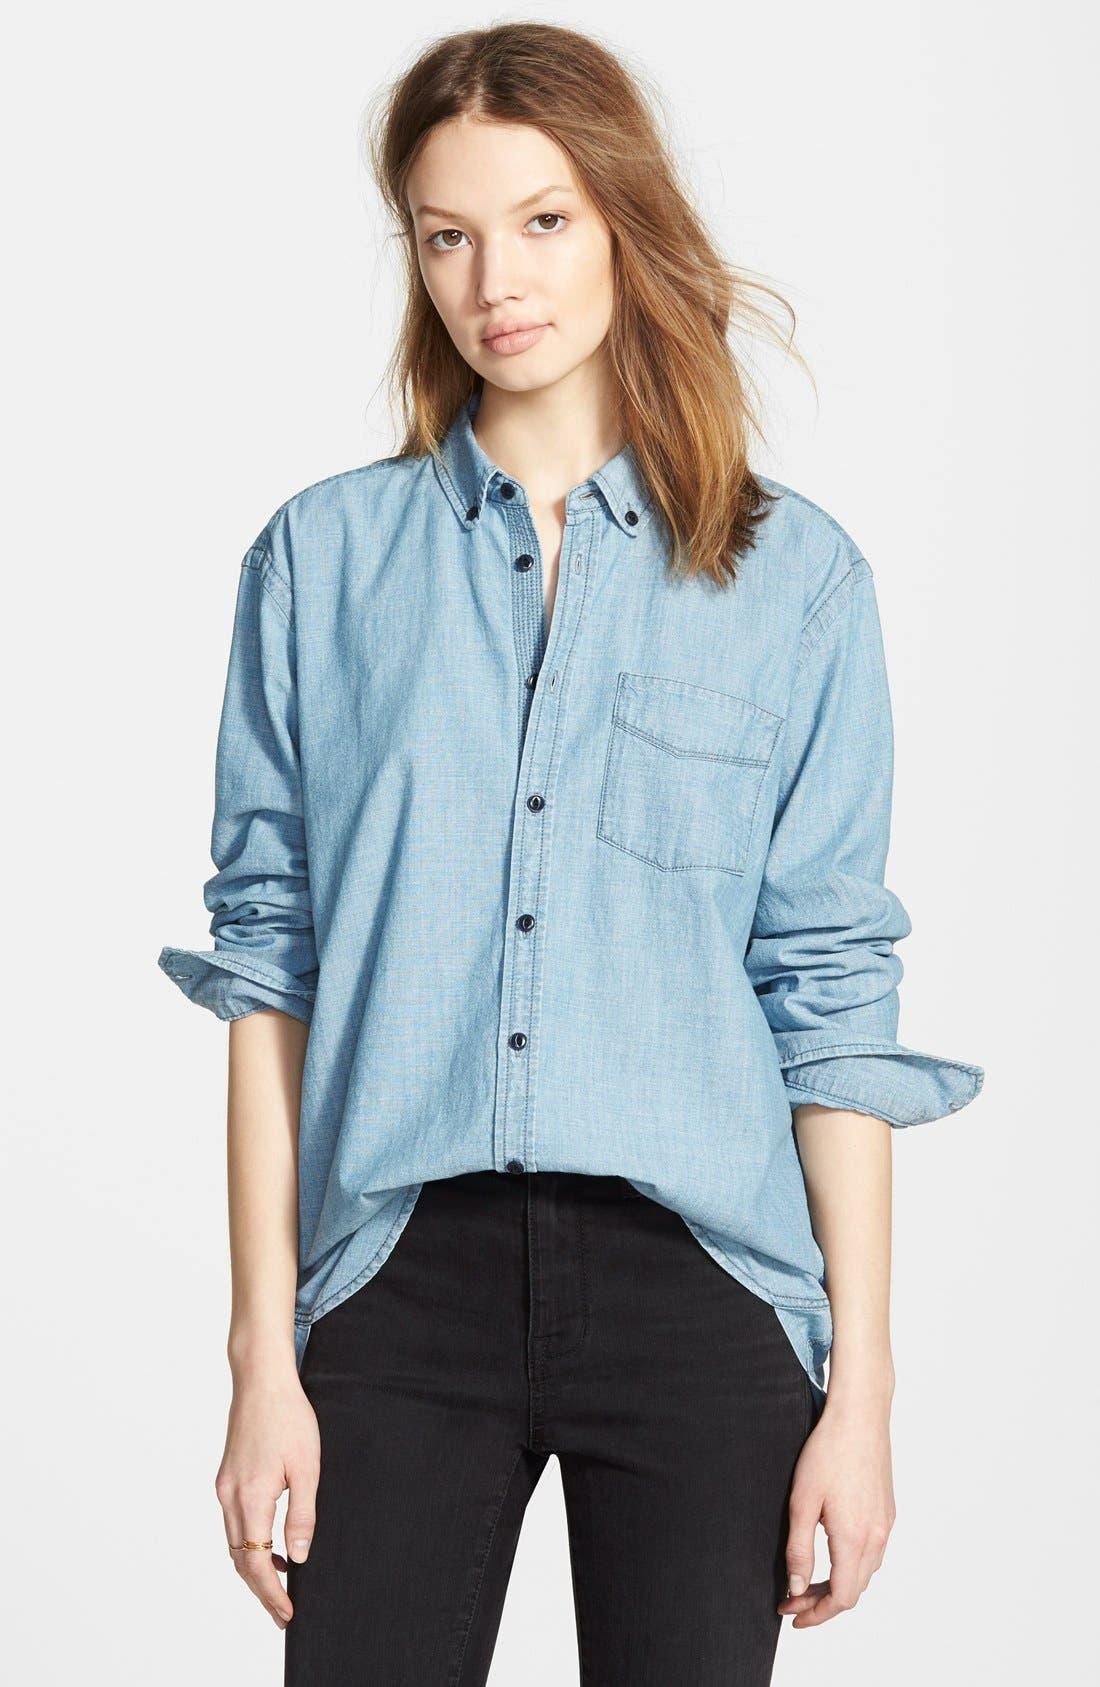 Alternate Image 1 Selected - Madewell Oversize Chambray Shirt